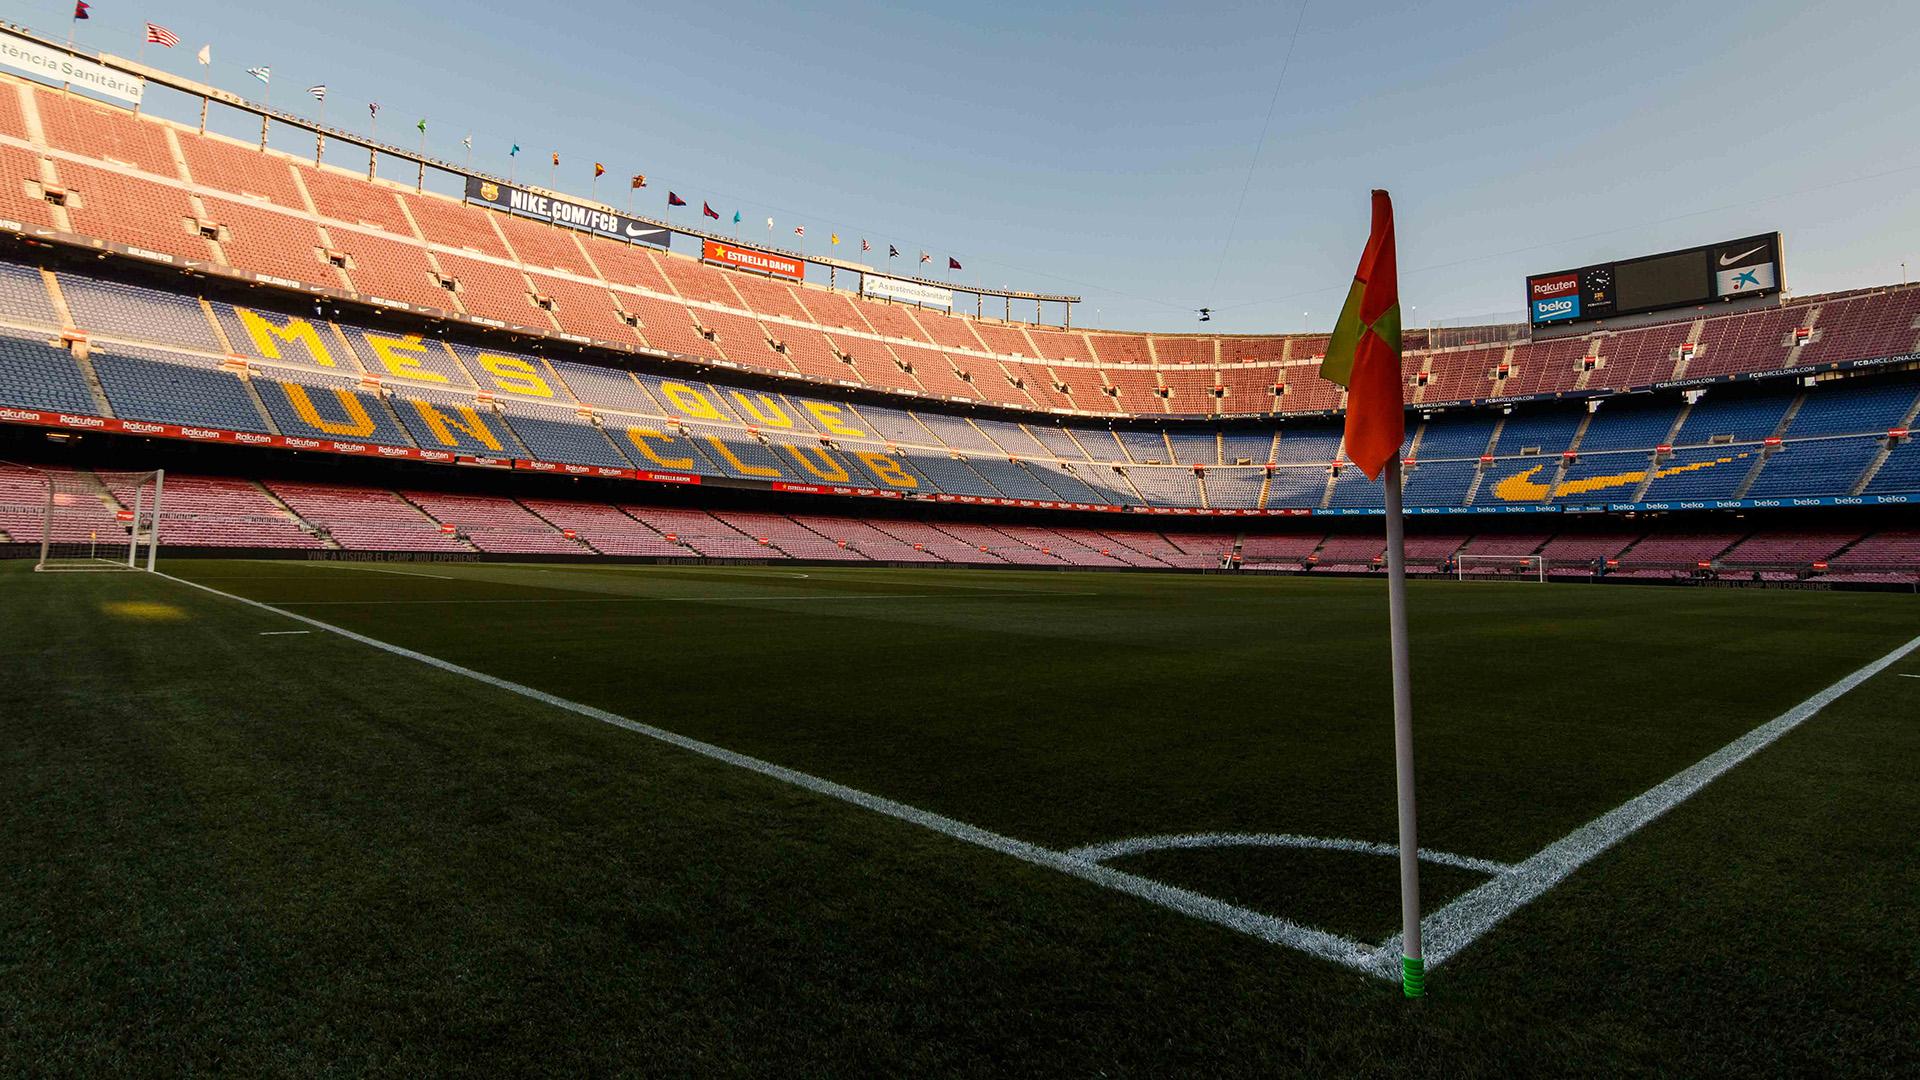 Camp Nou - LaLiga